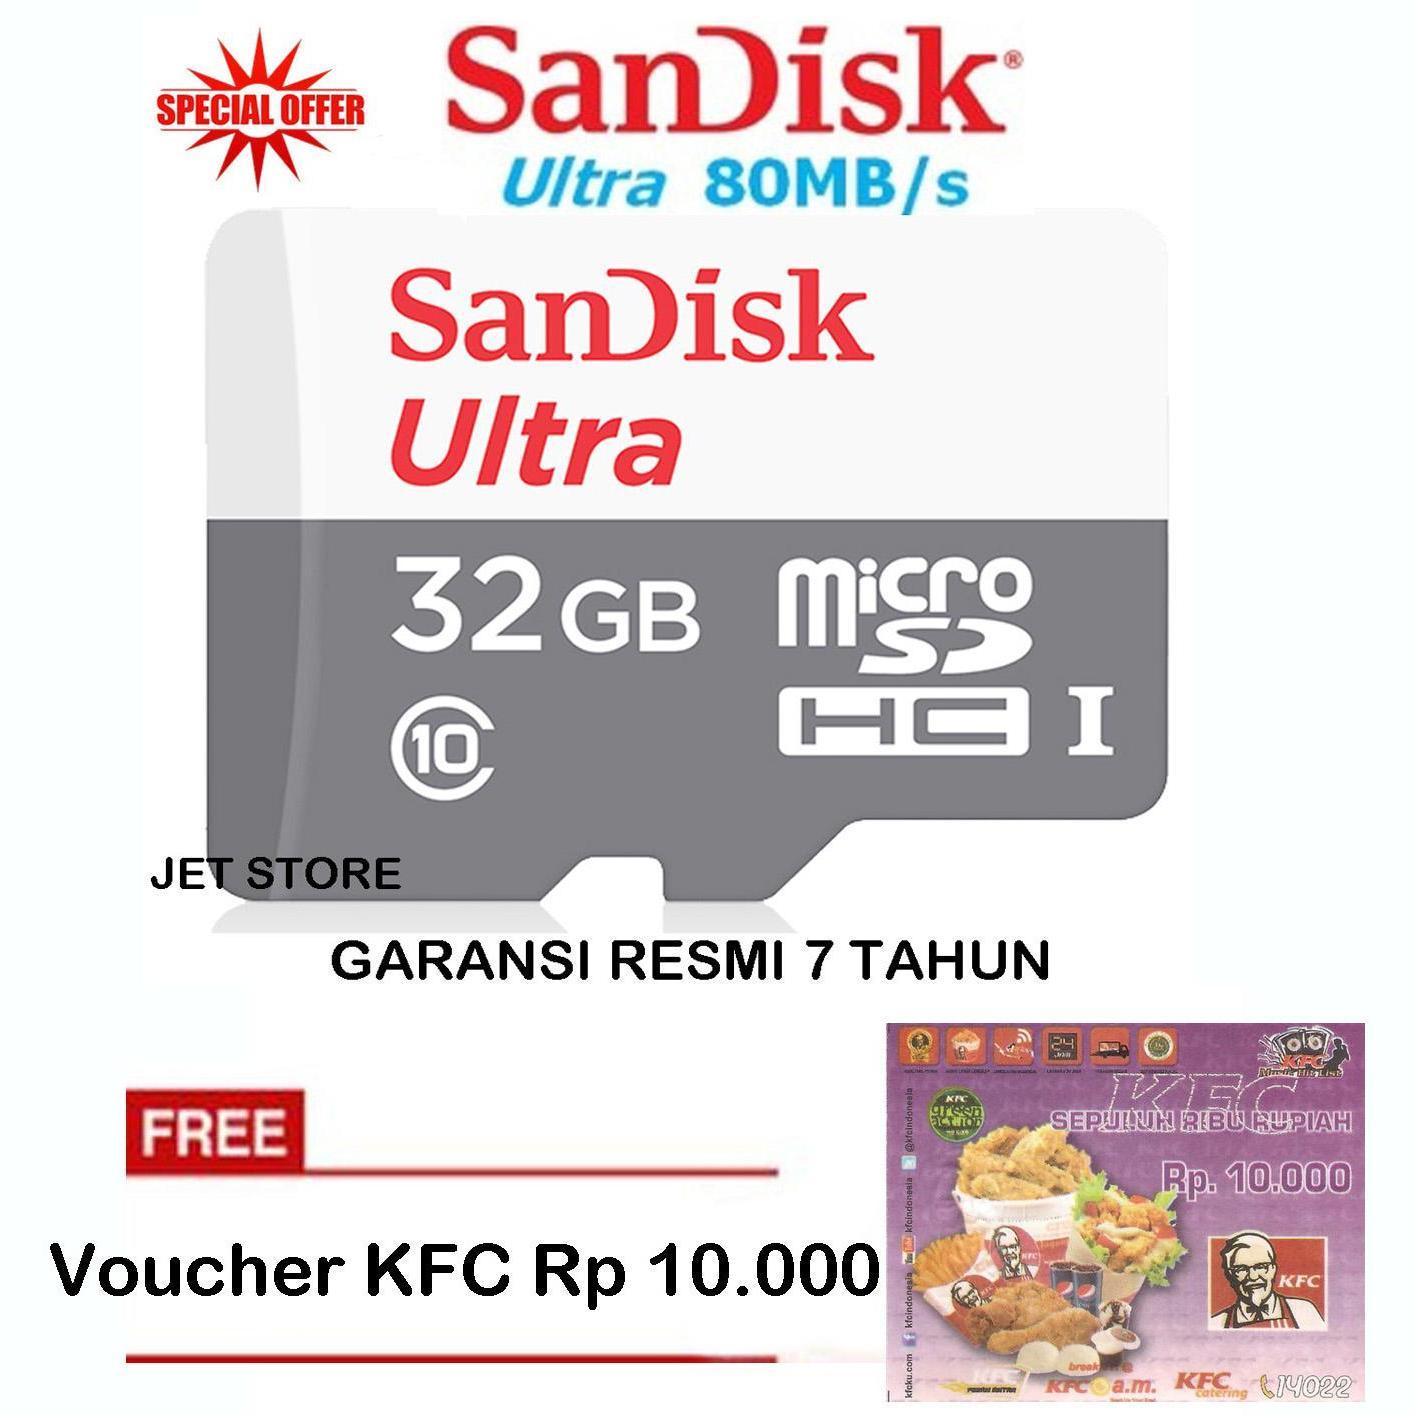 Kartu Memori Sandisk Terbaru Micro Sd Class 4 32gb Garansi Resmi Ultra Microsdhc 32 Gb 80mb S Putih Voucher Kfc